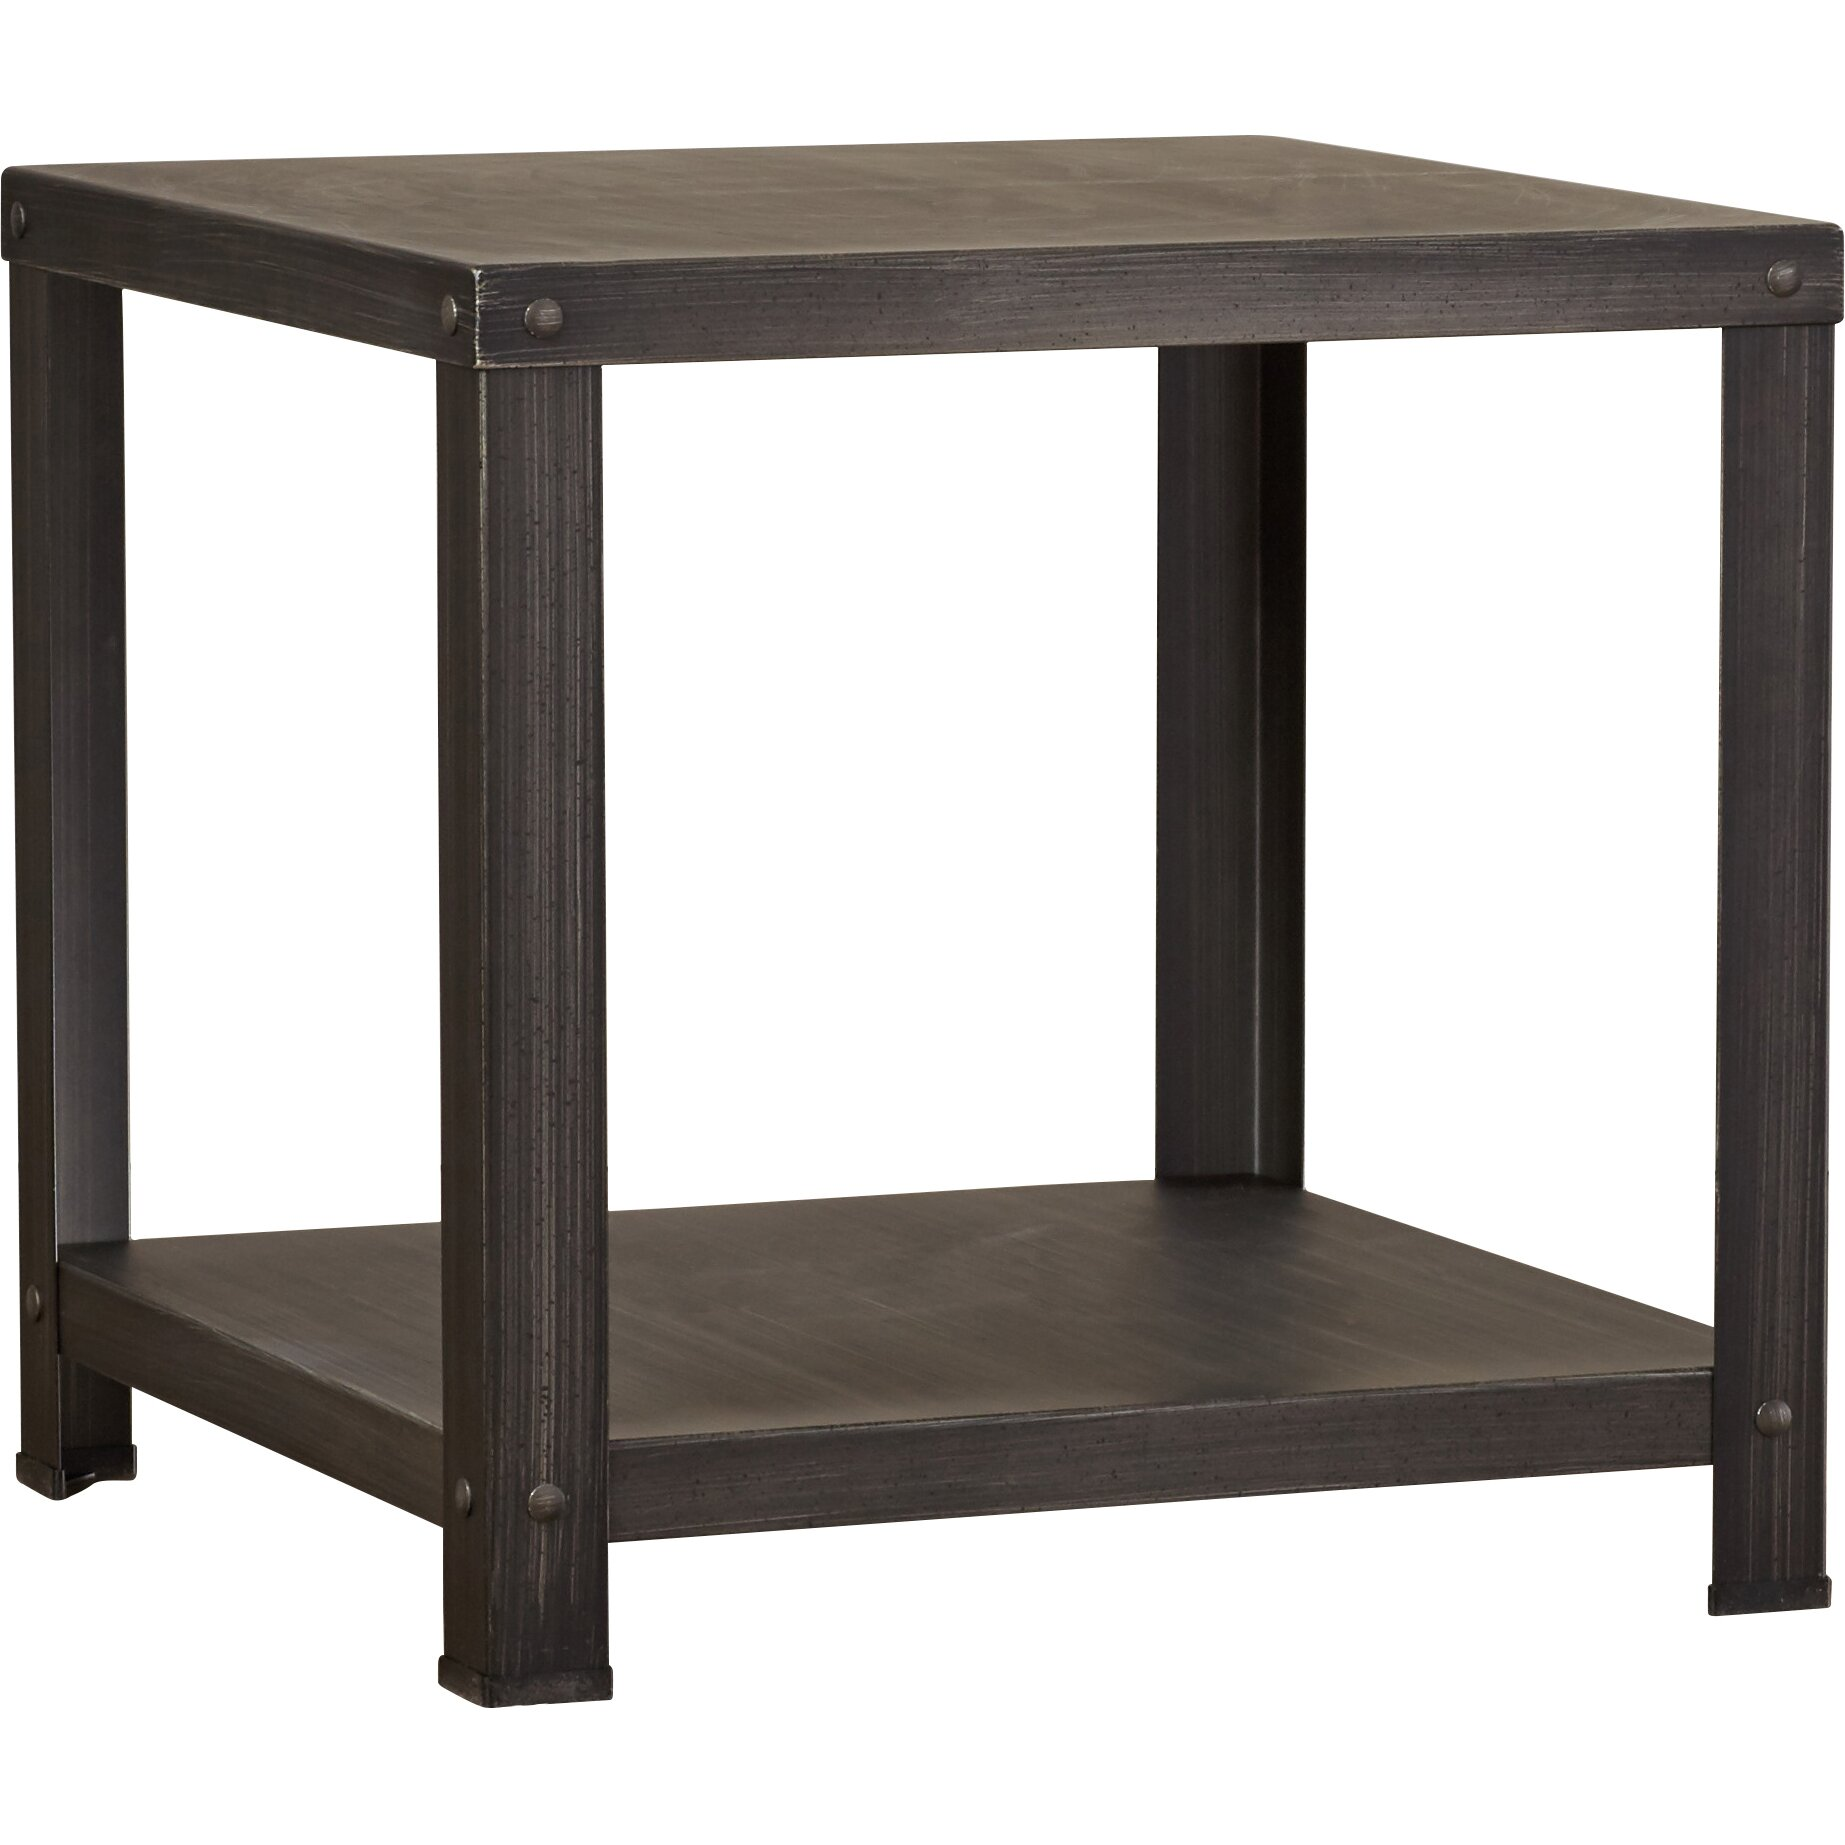 Trent Austin Design Laguna Coffee Table Reviews: Trent Austin Design Seward End Table & Reviews